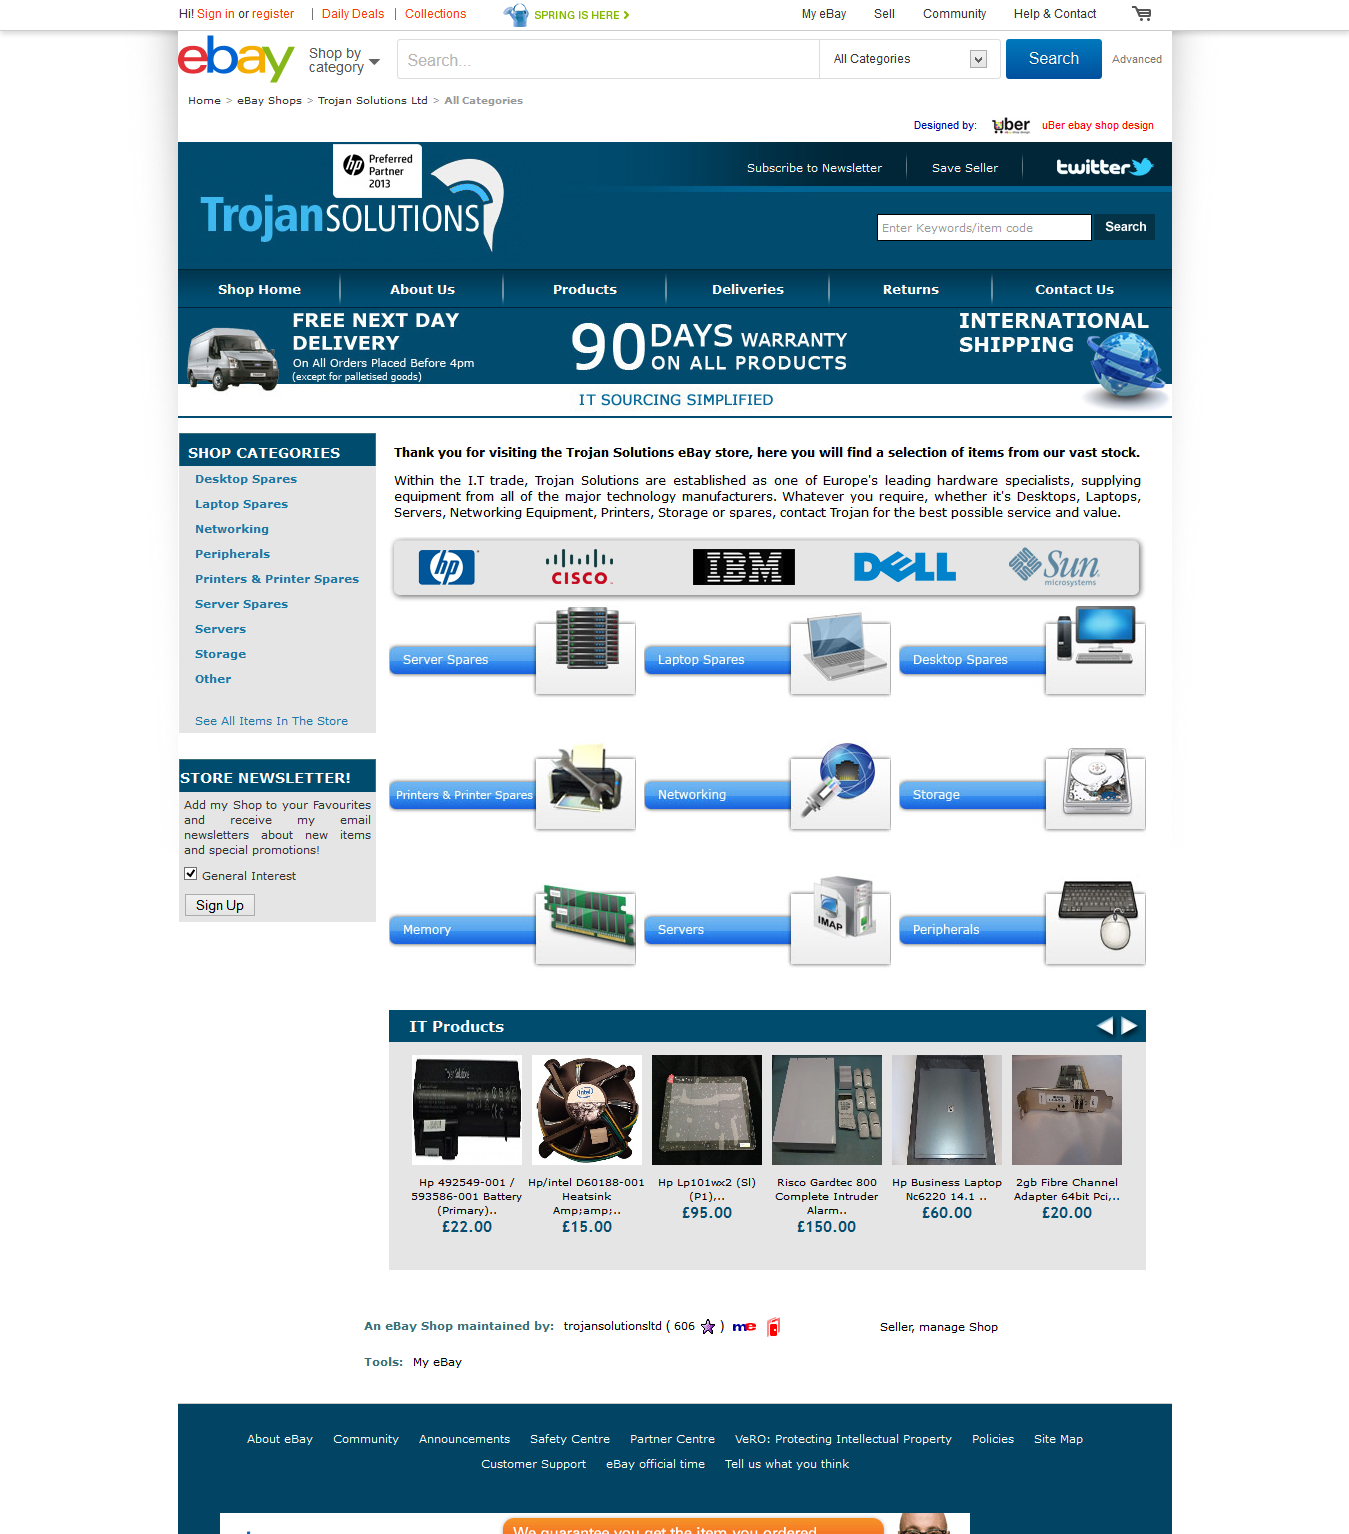 Trojan Solutions Ltd ebay shop design